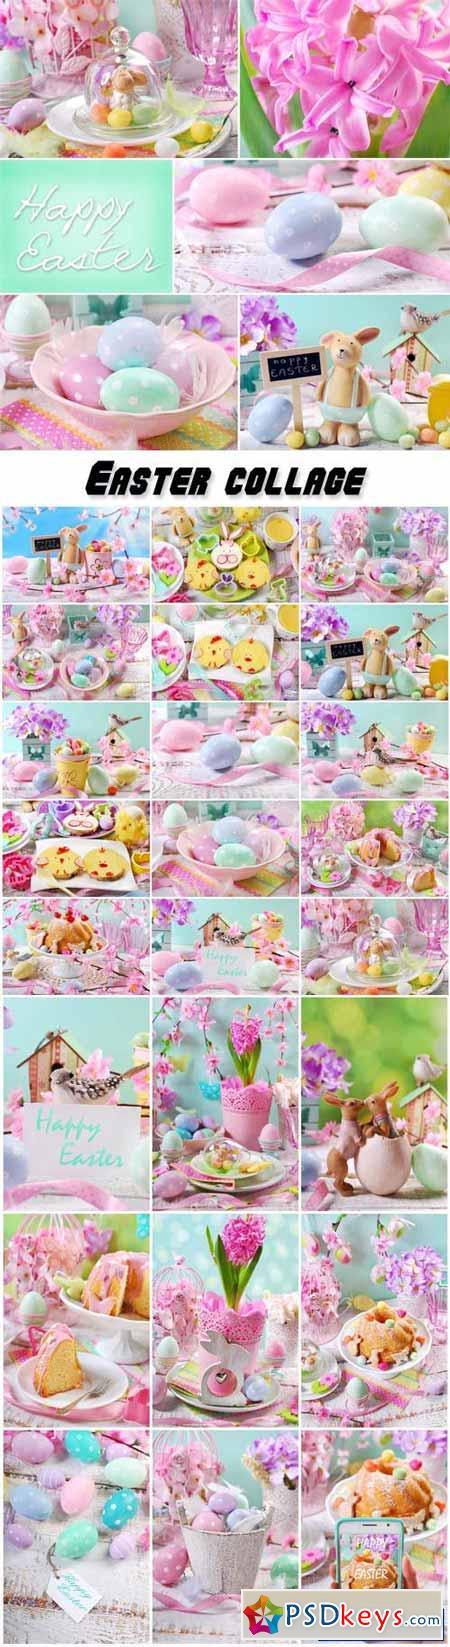 Easter collage, easter cake, easter eggs